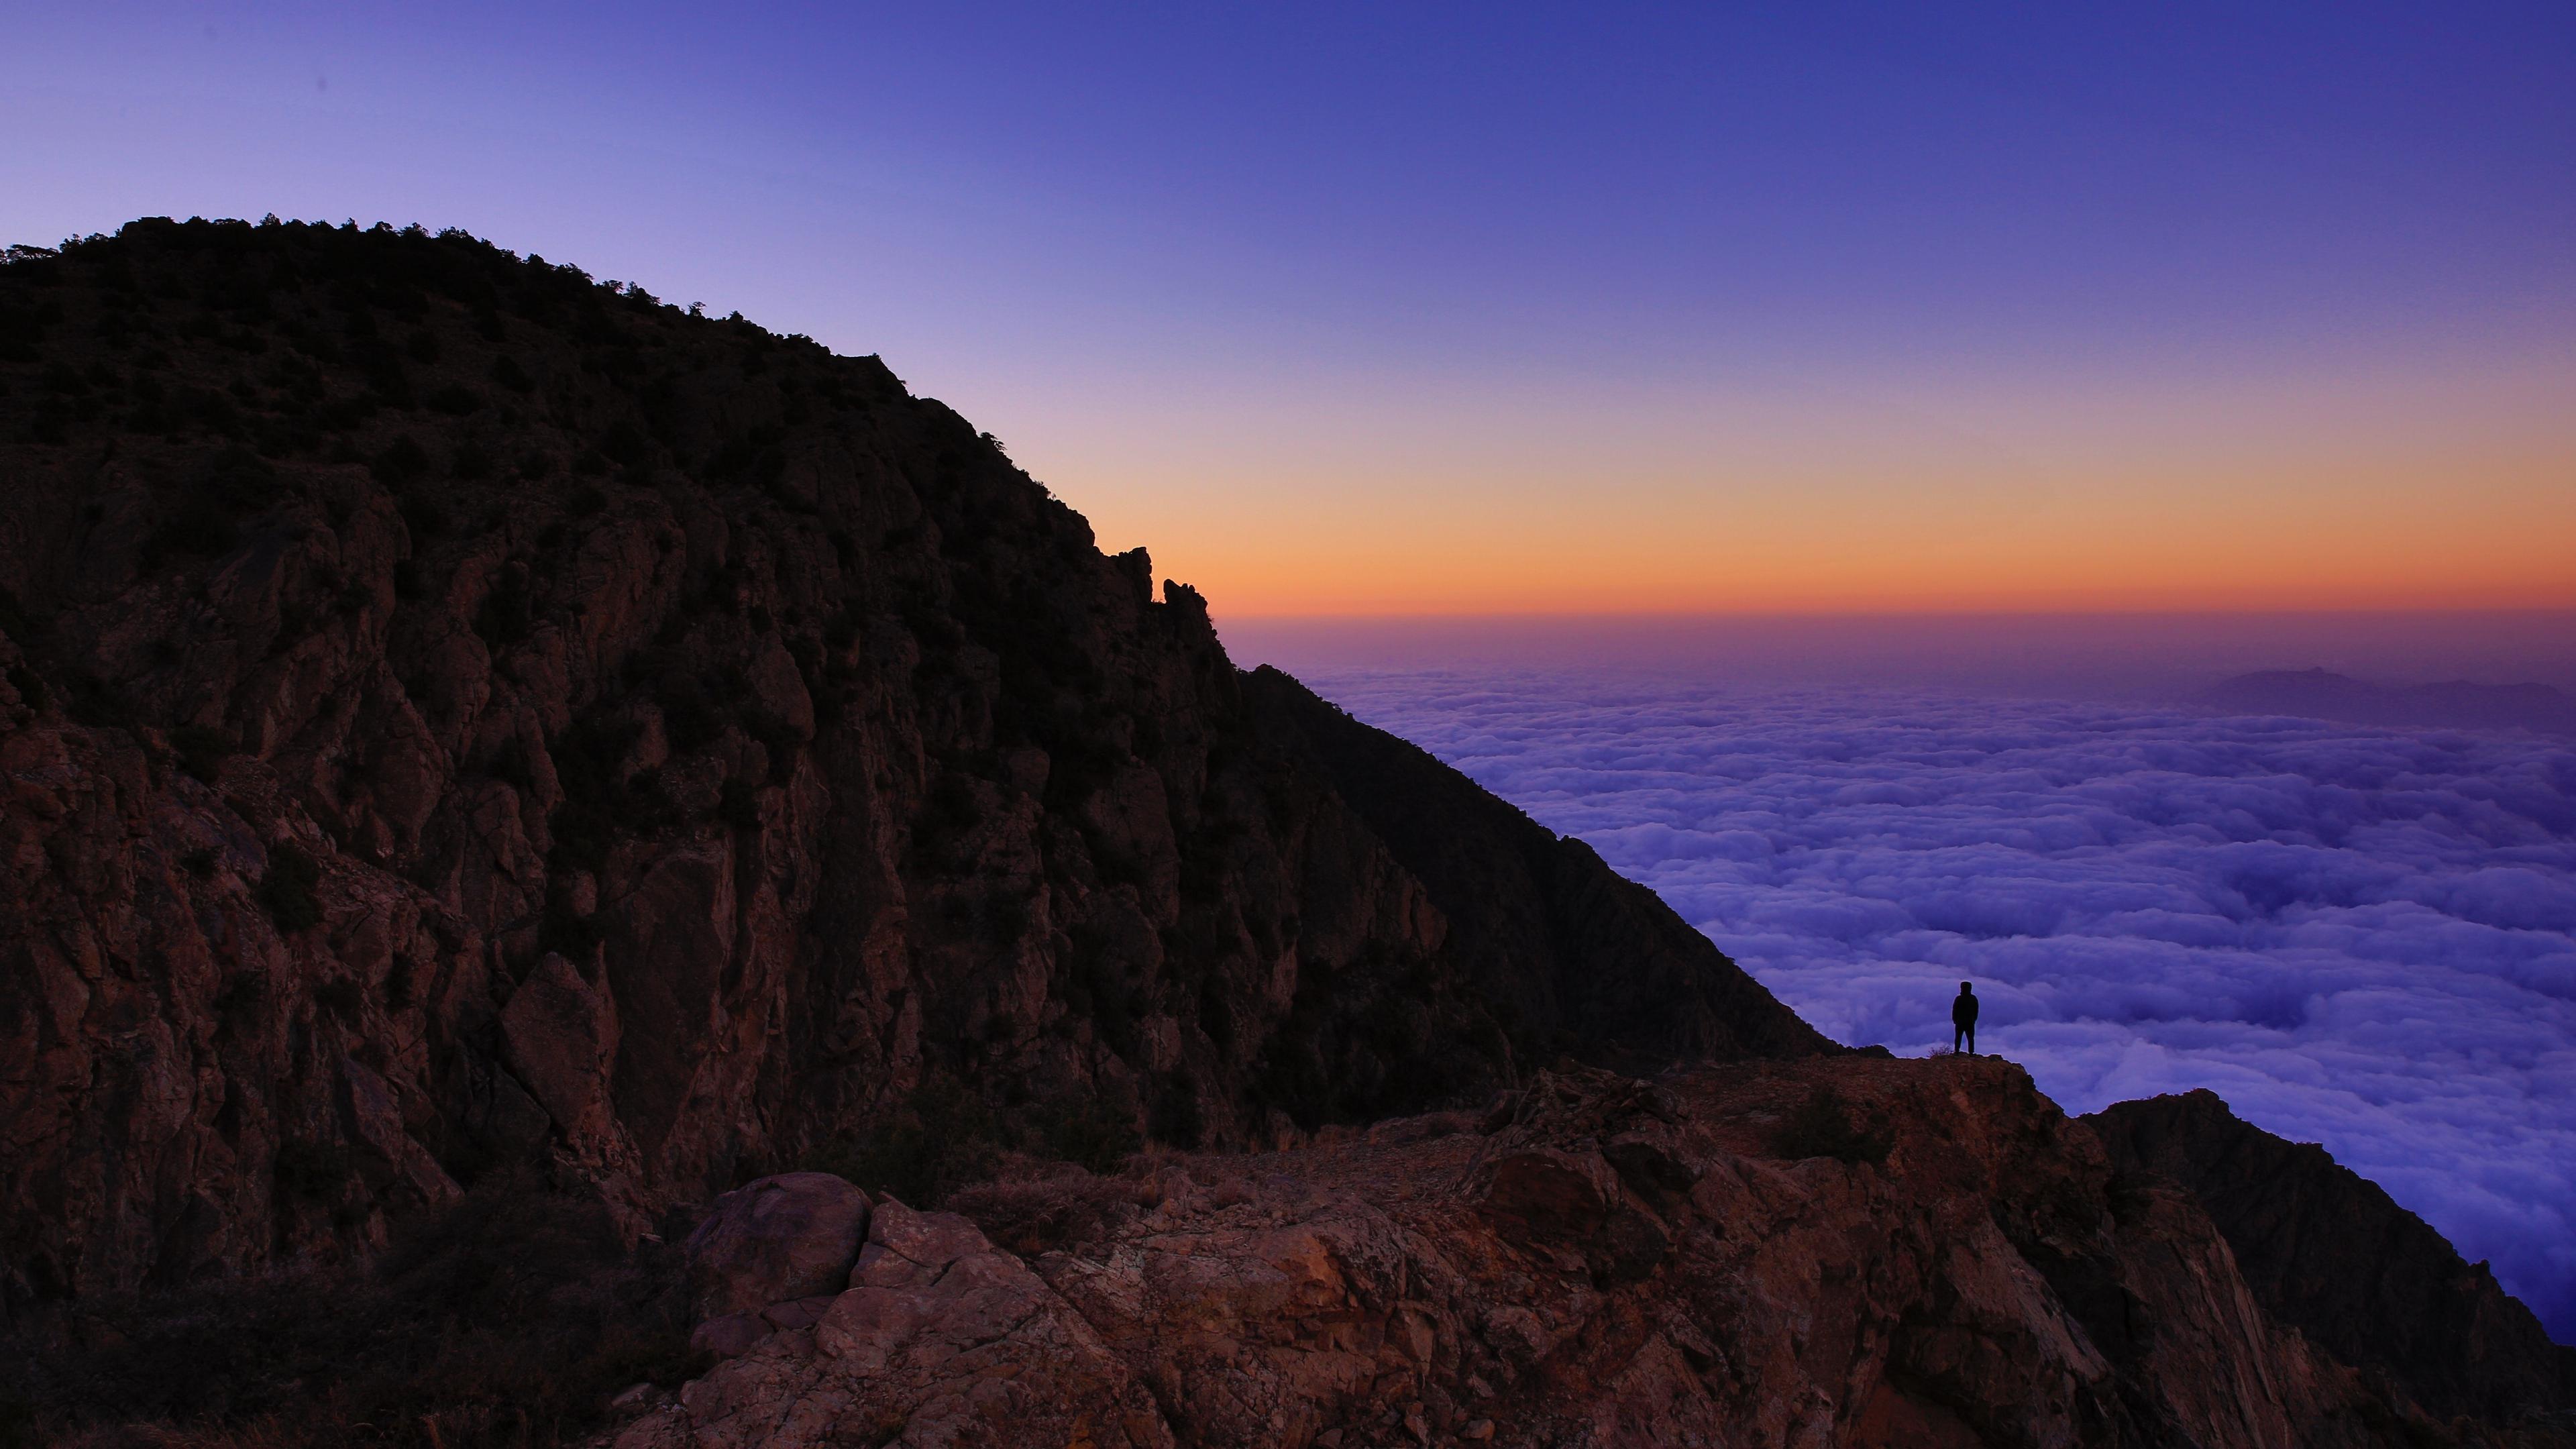 mountain man loneliness clouds al bahah saudi arabia 4k 1541115238 - mountain, man, loneliness, clouds, al bahah, saudi arabia 4k - Mountain, Man, loneliness